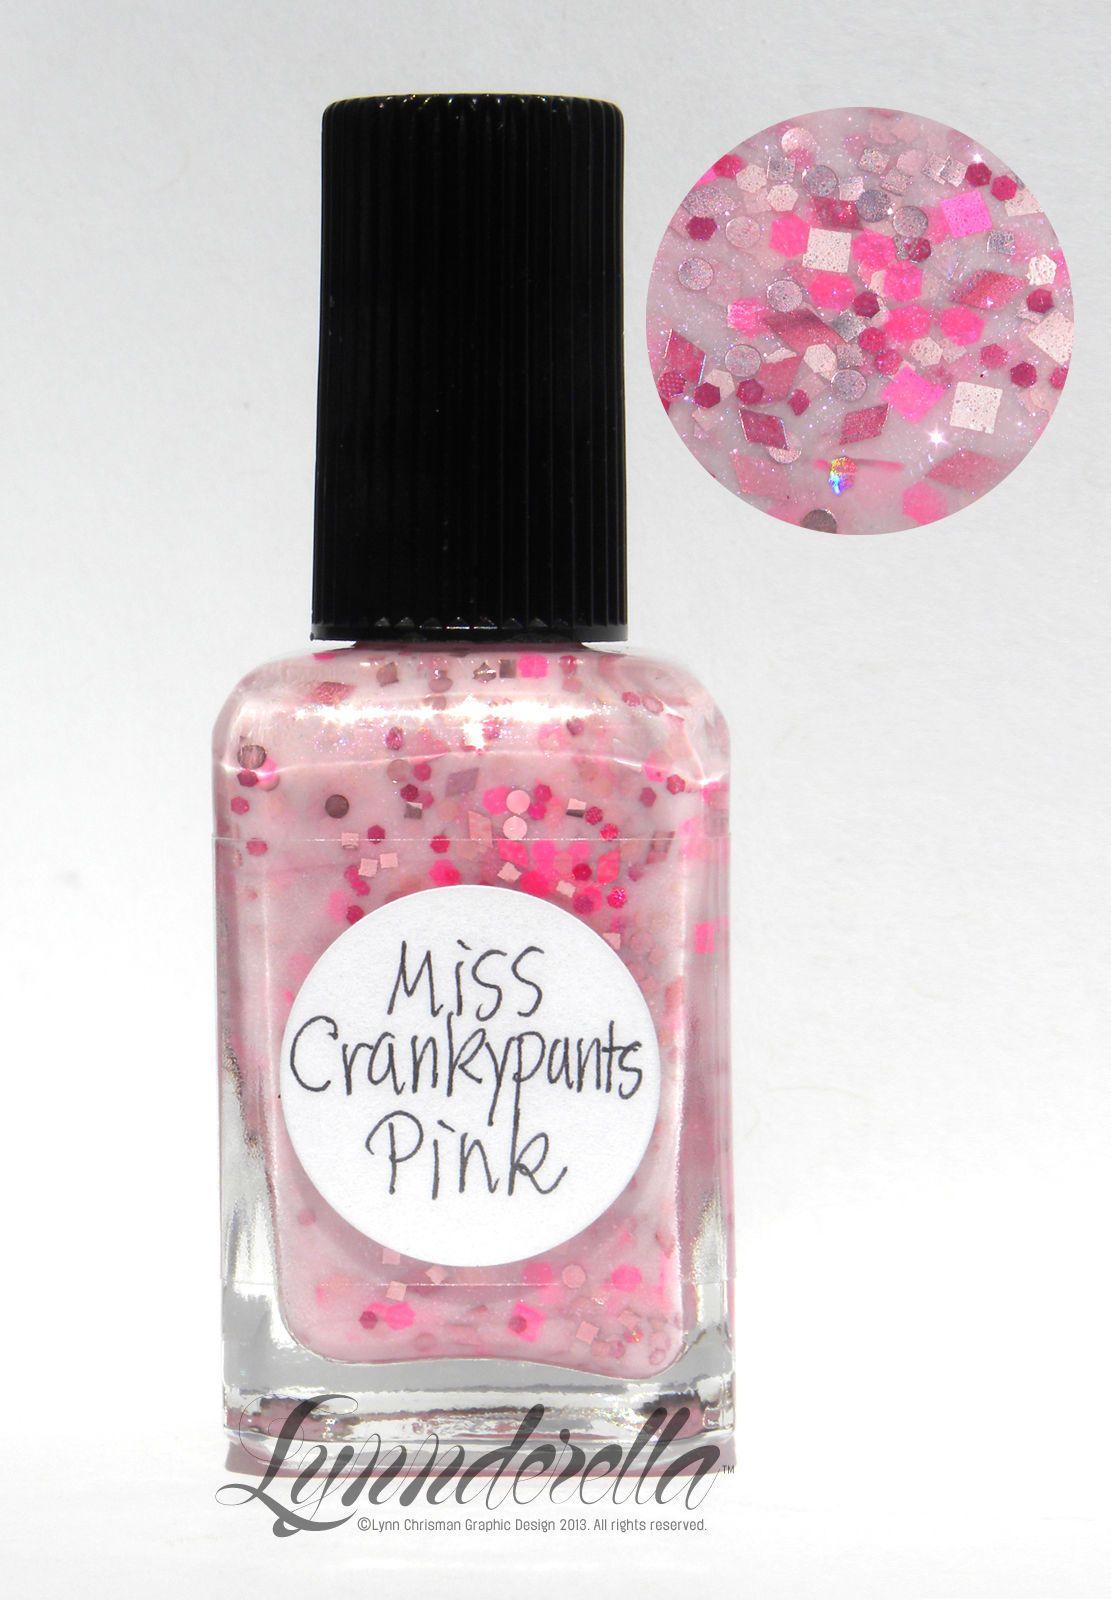 Miss Crankypants Pink